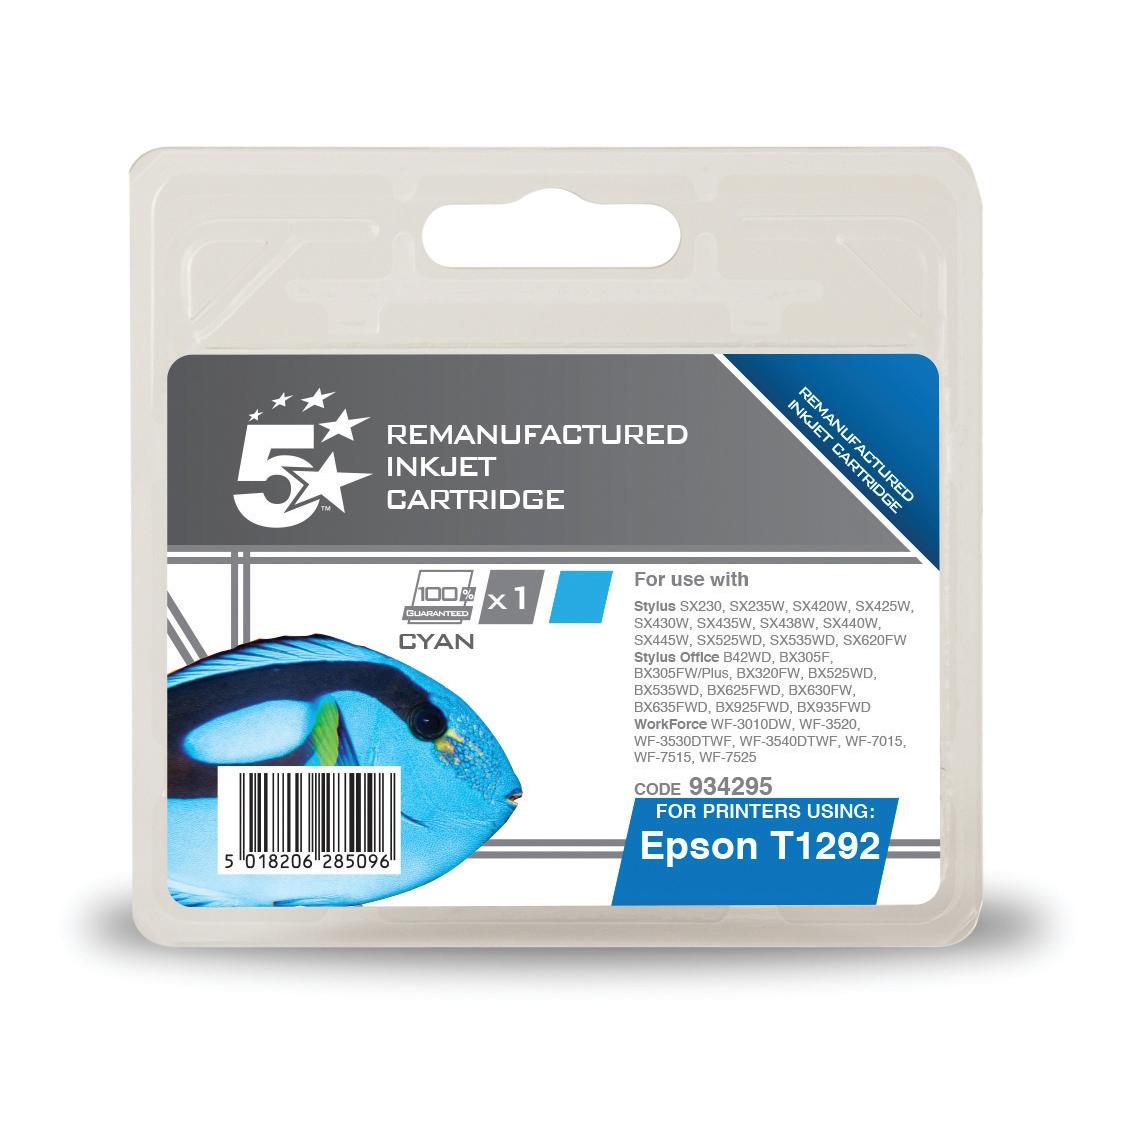 5 Star Office Remanufactured Inkjet Cartridge Page Life 445pp 7ml Cyan [Epson T1292 Alternative]